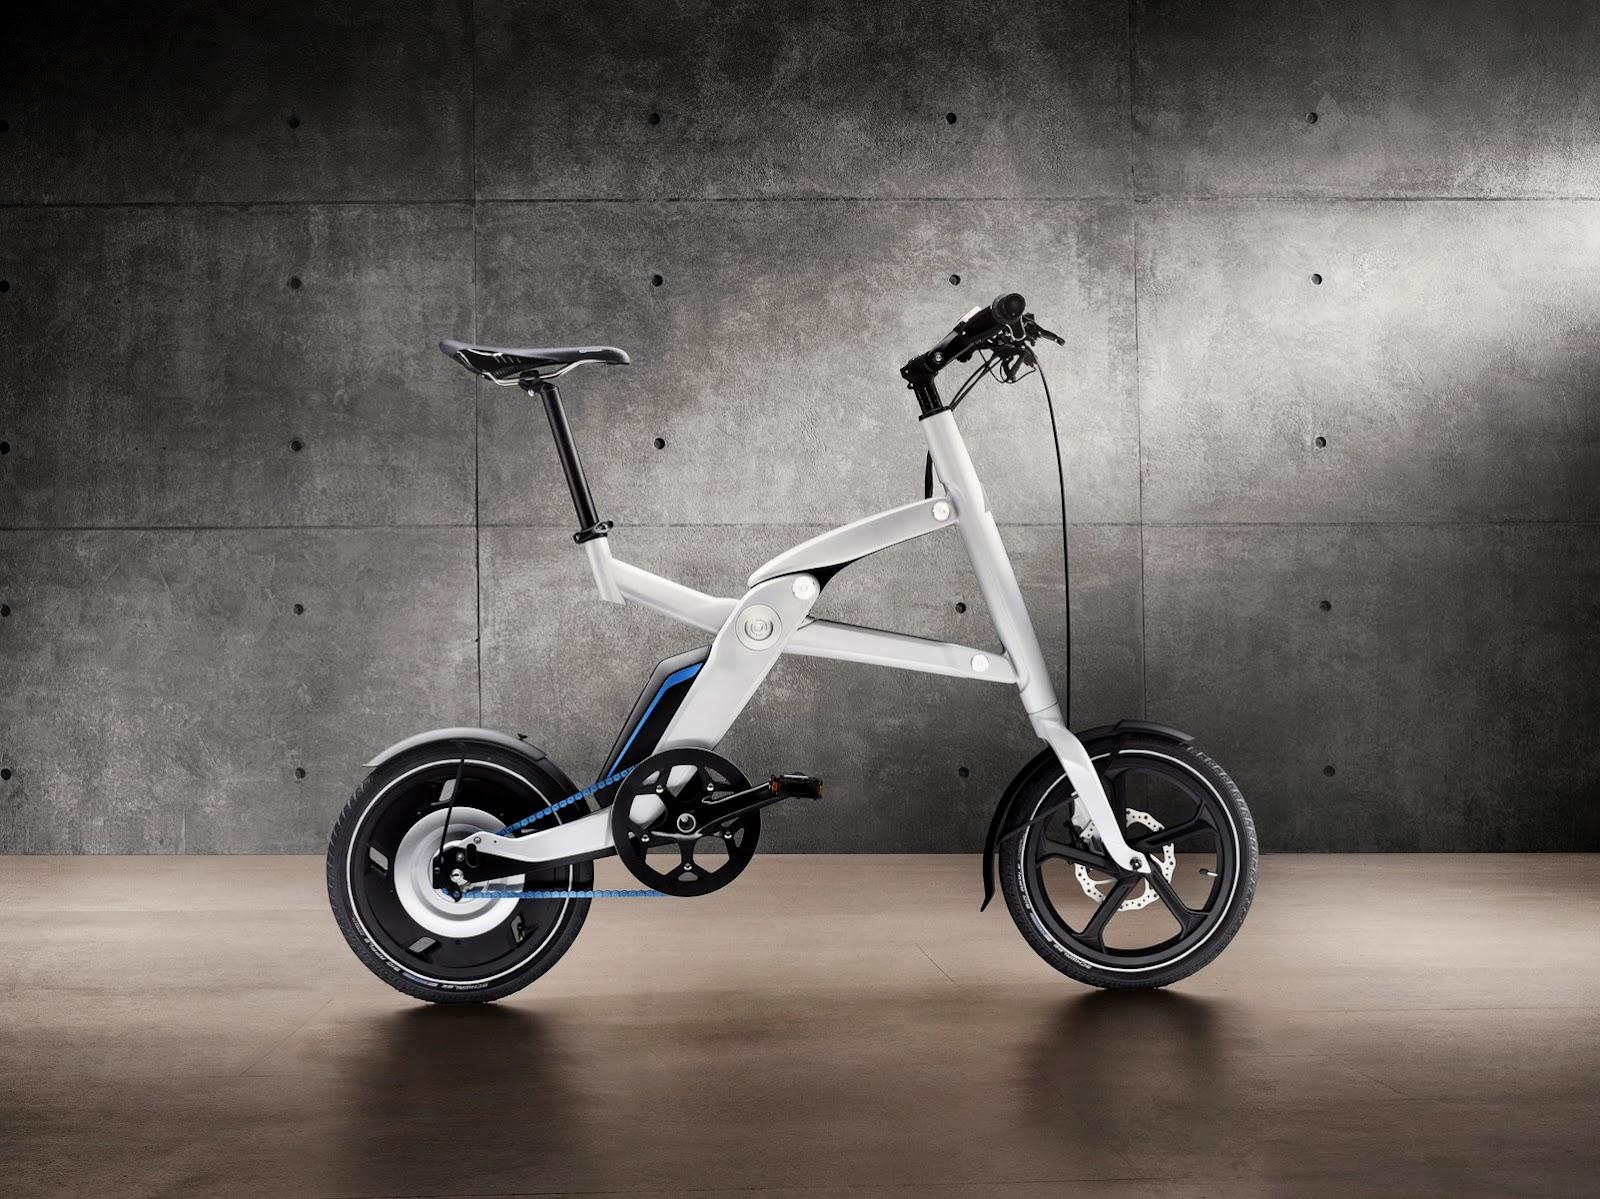 bmw i pedelec concept bicycle hd wallpaper carwallbase.blo.com